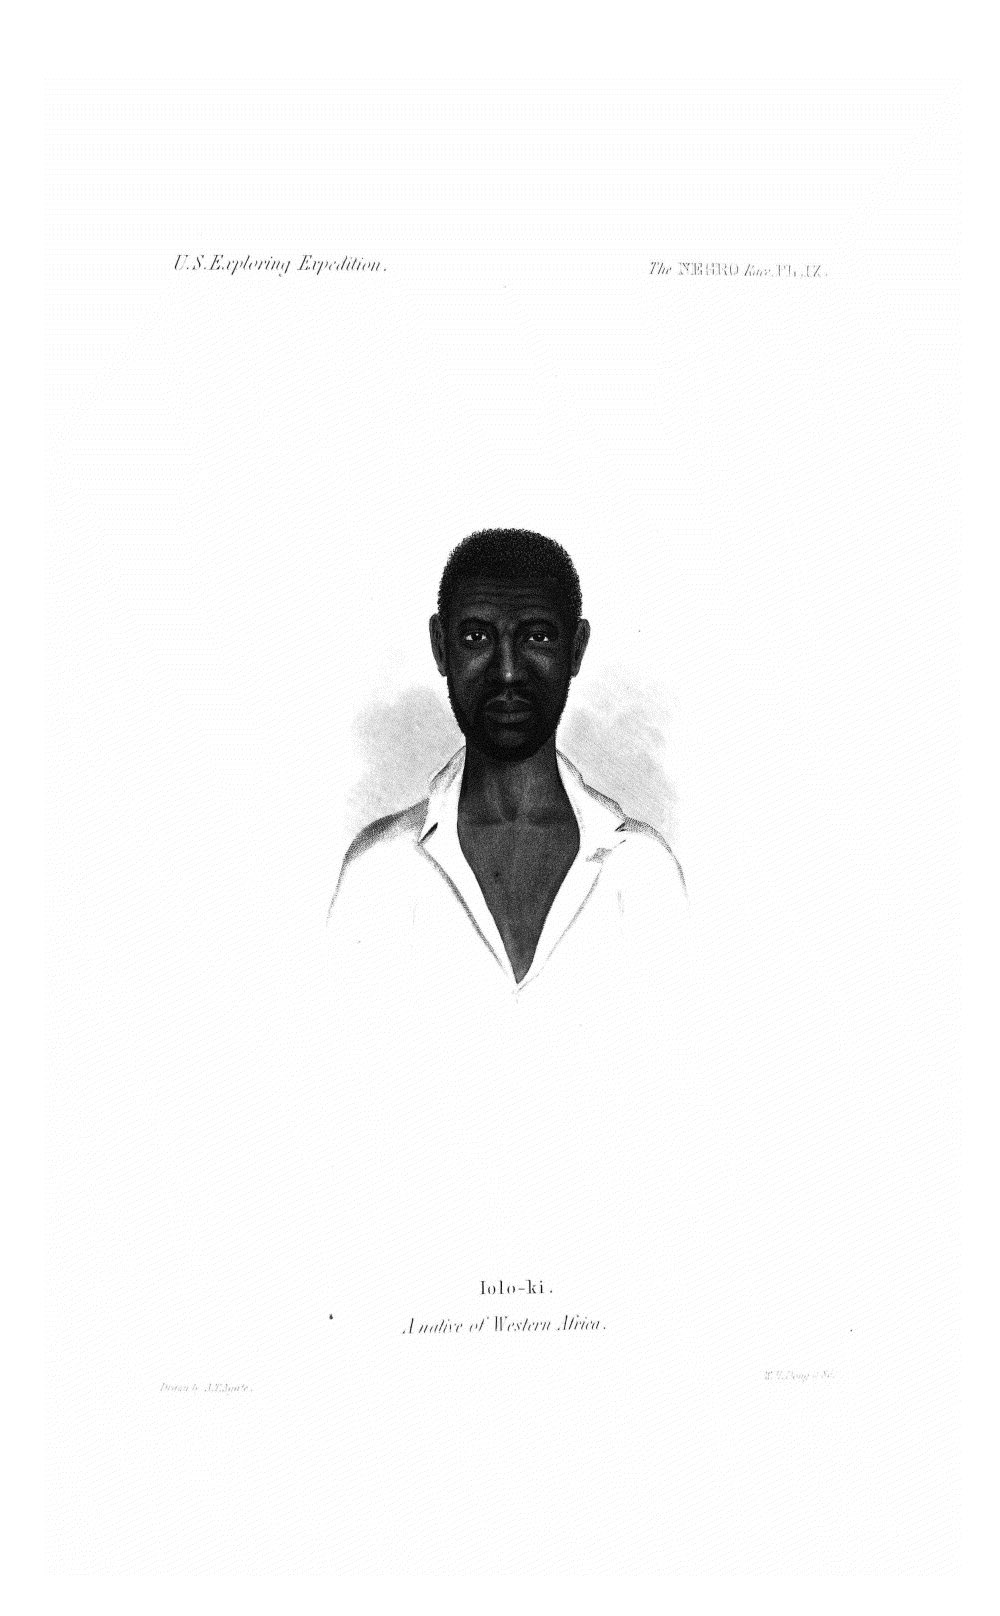 Negro Race Pl IX,  Image number:Sil19-13-204